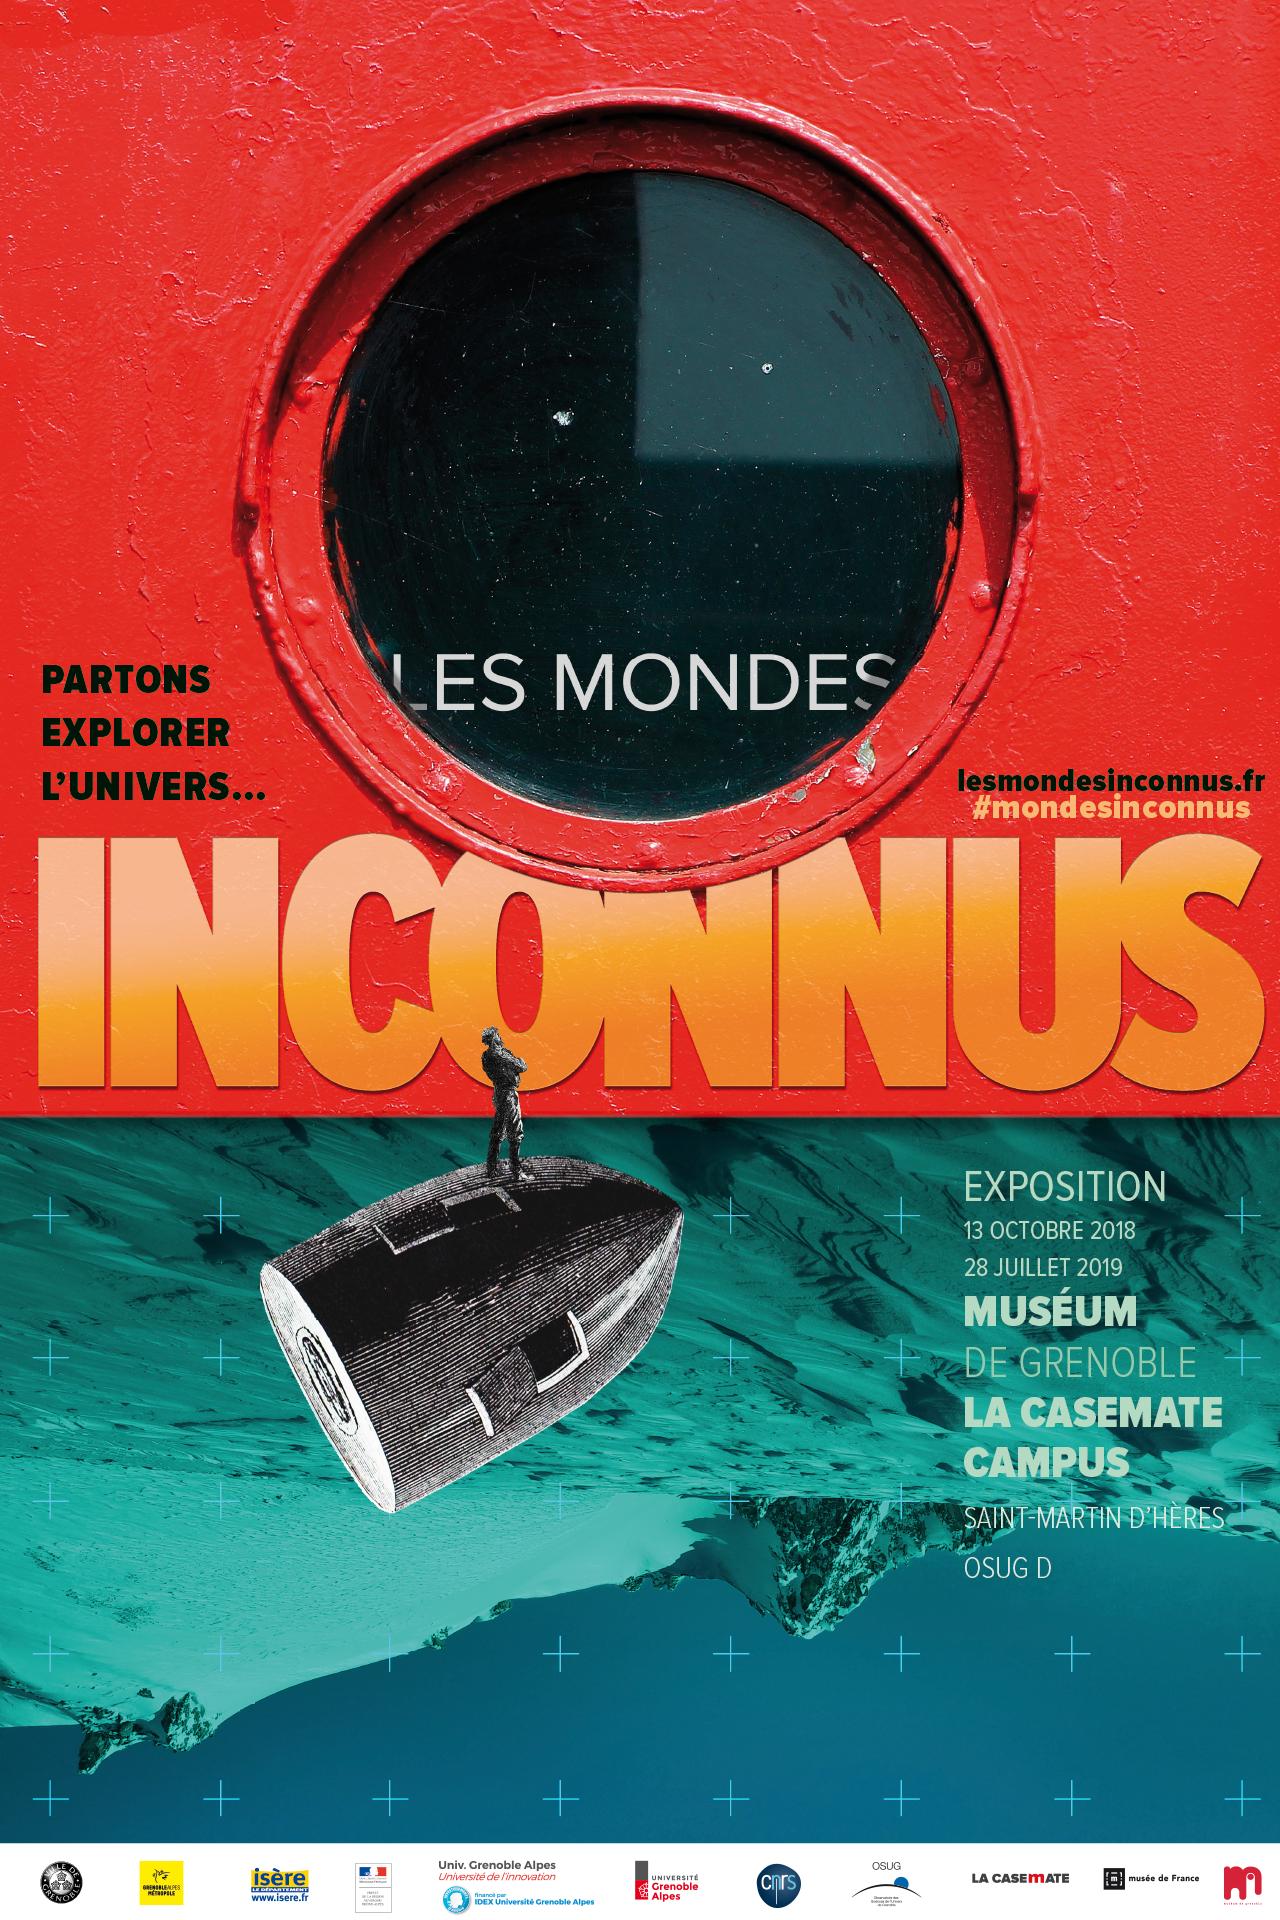 Les Mondes Inconnus